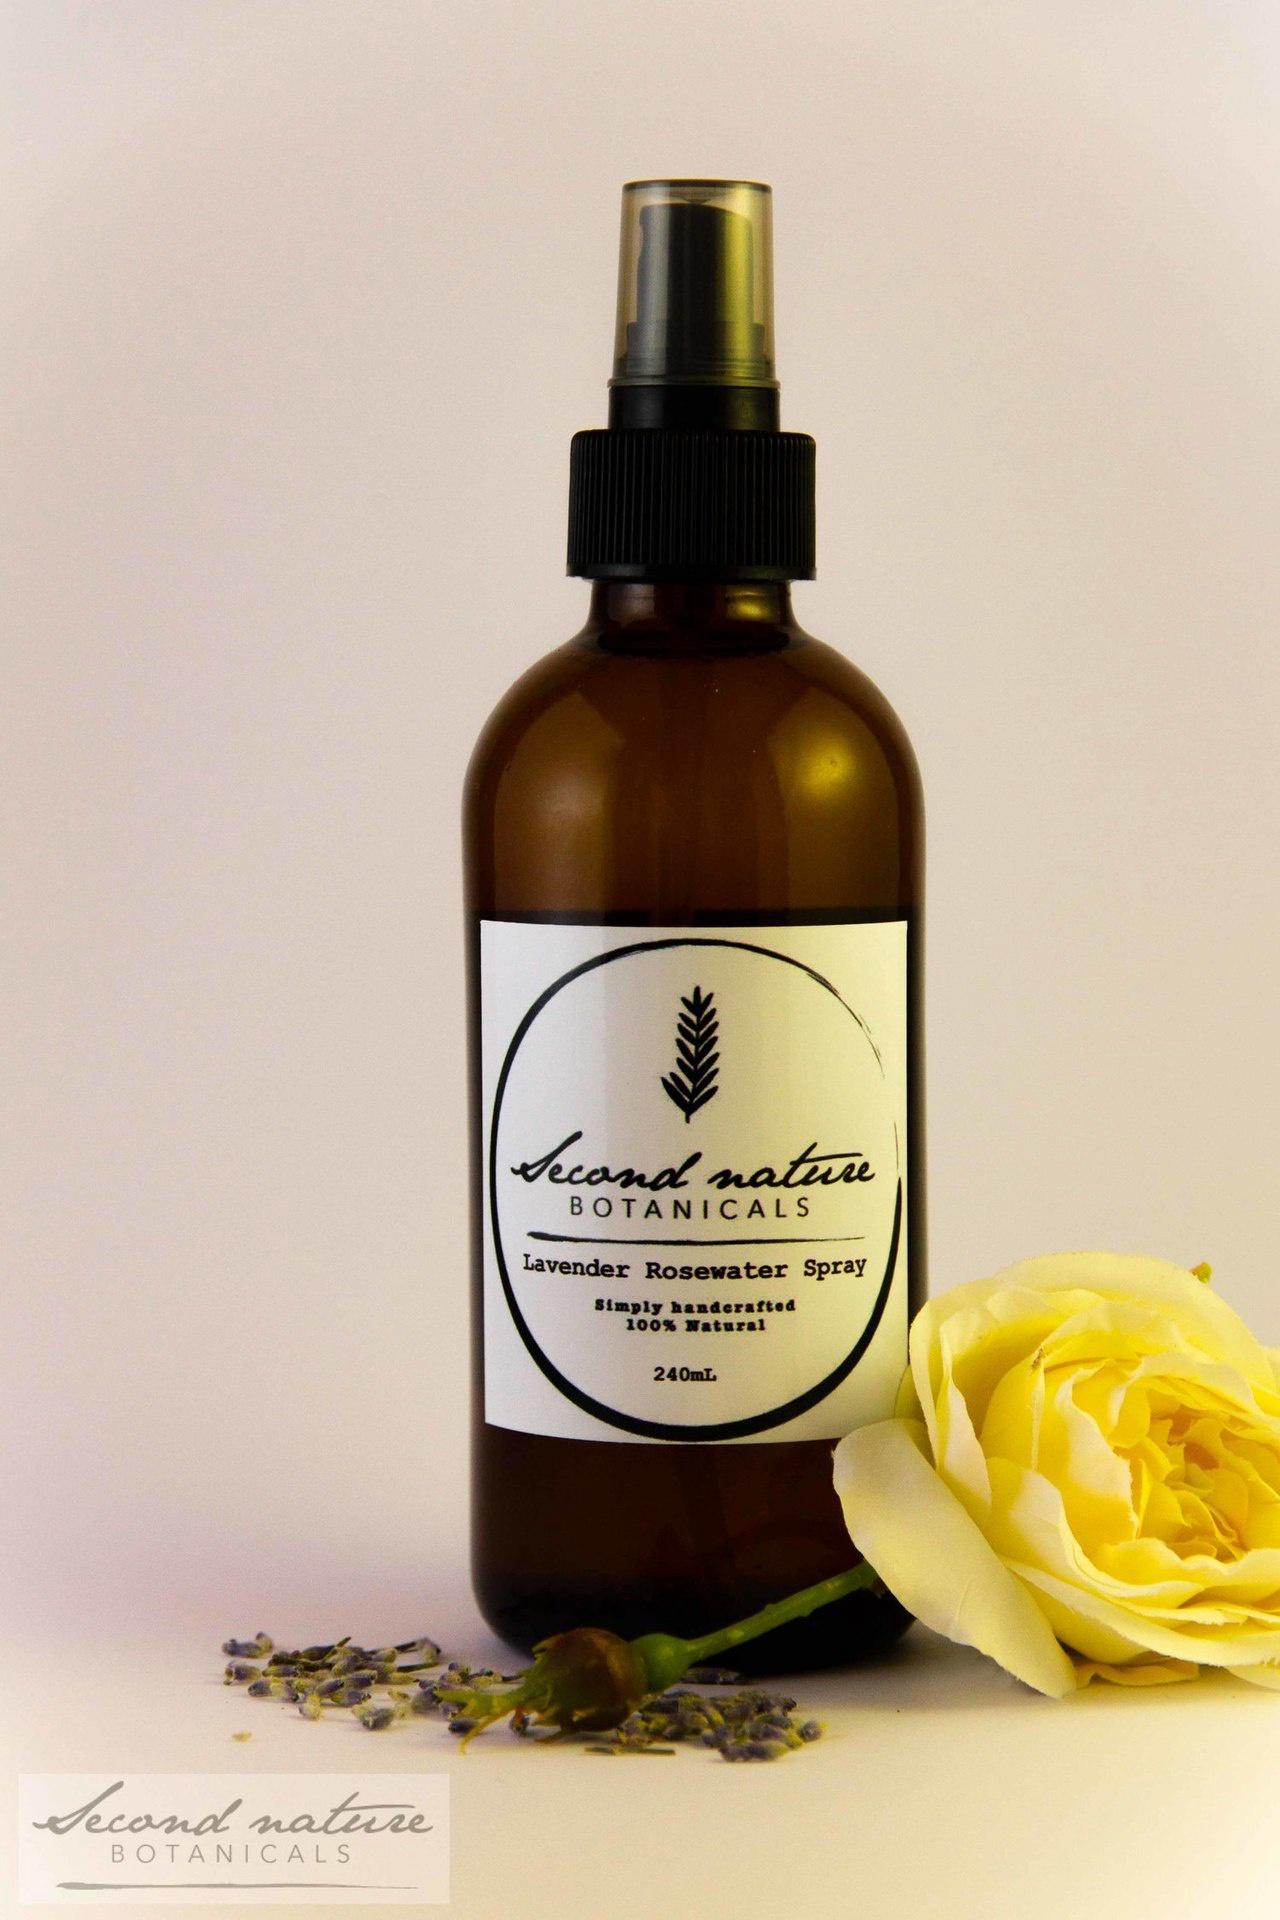 Lavender Rosewater Spray